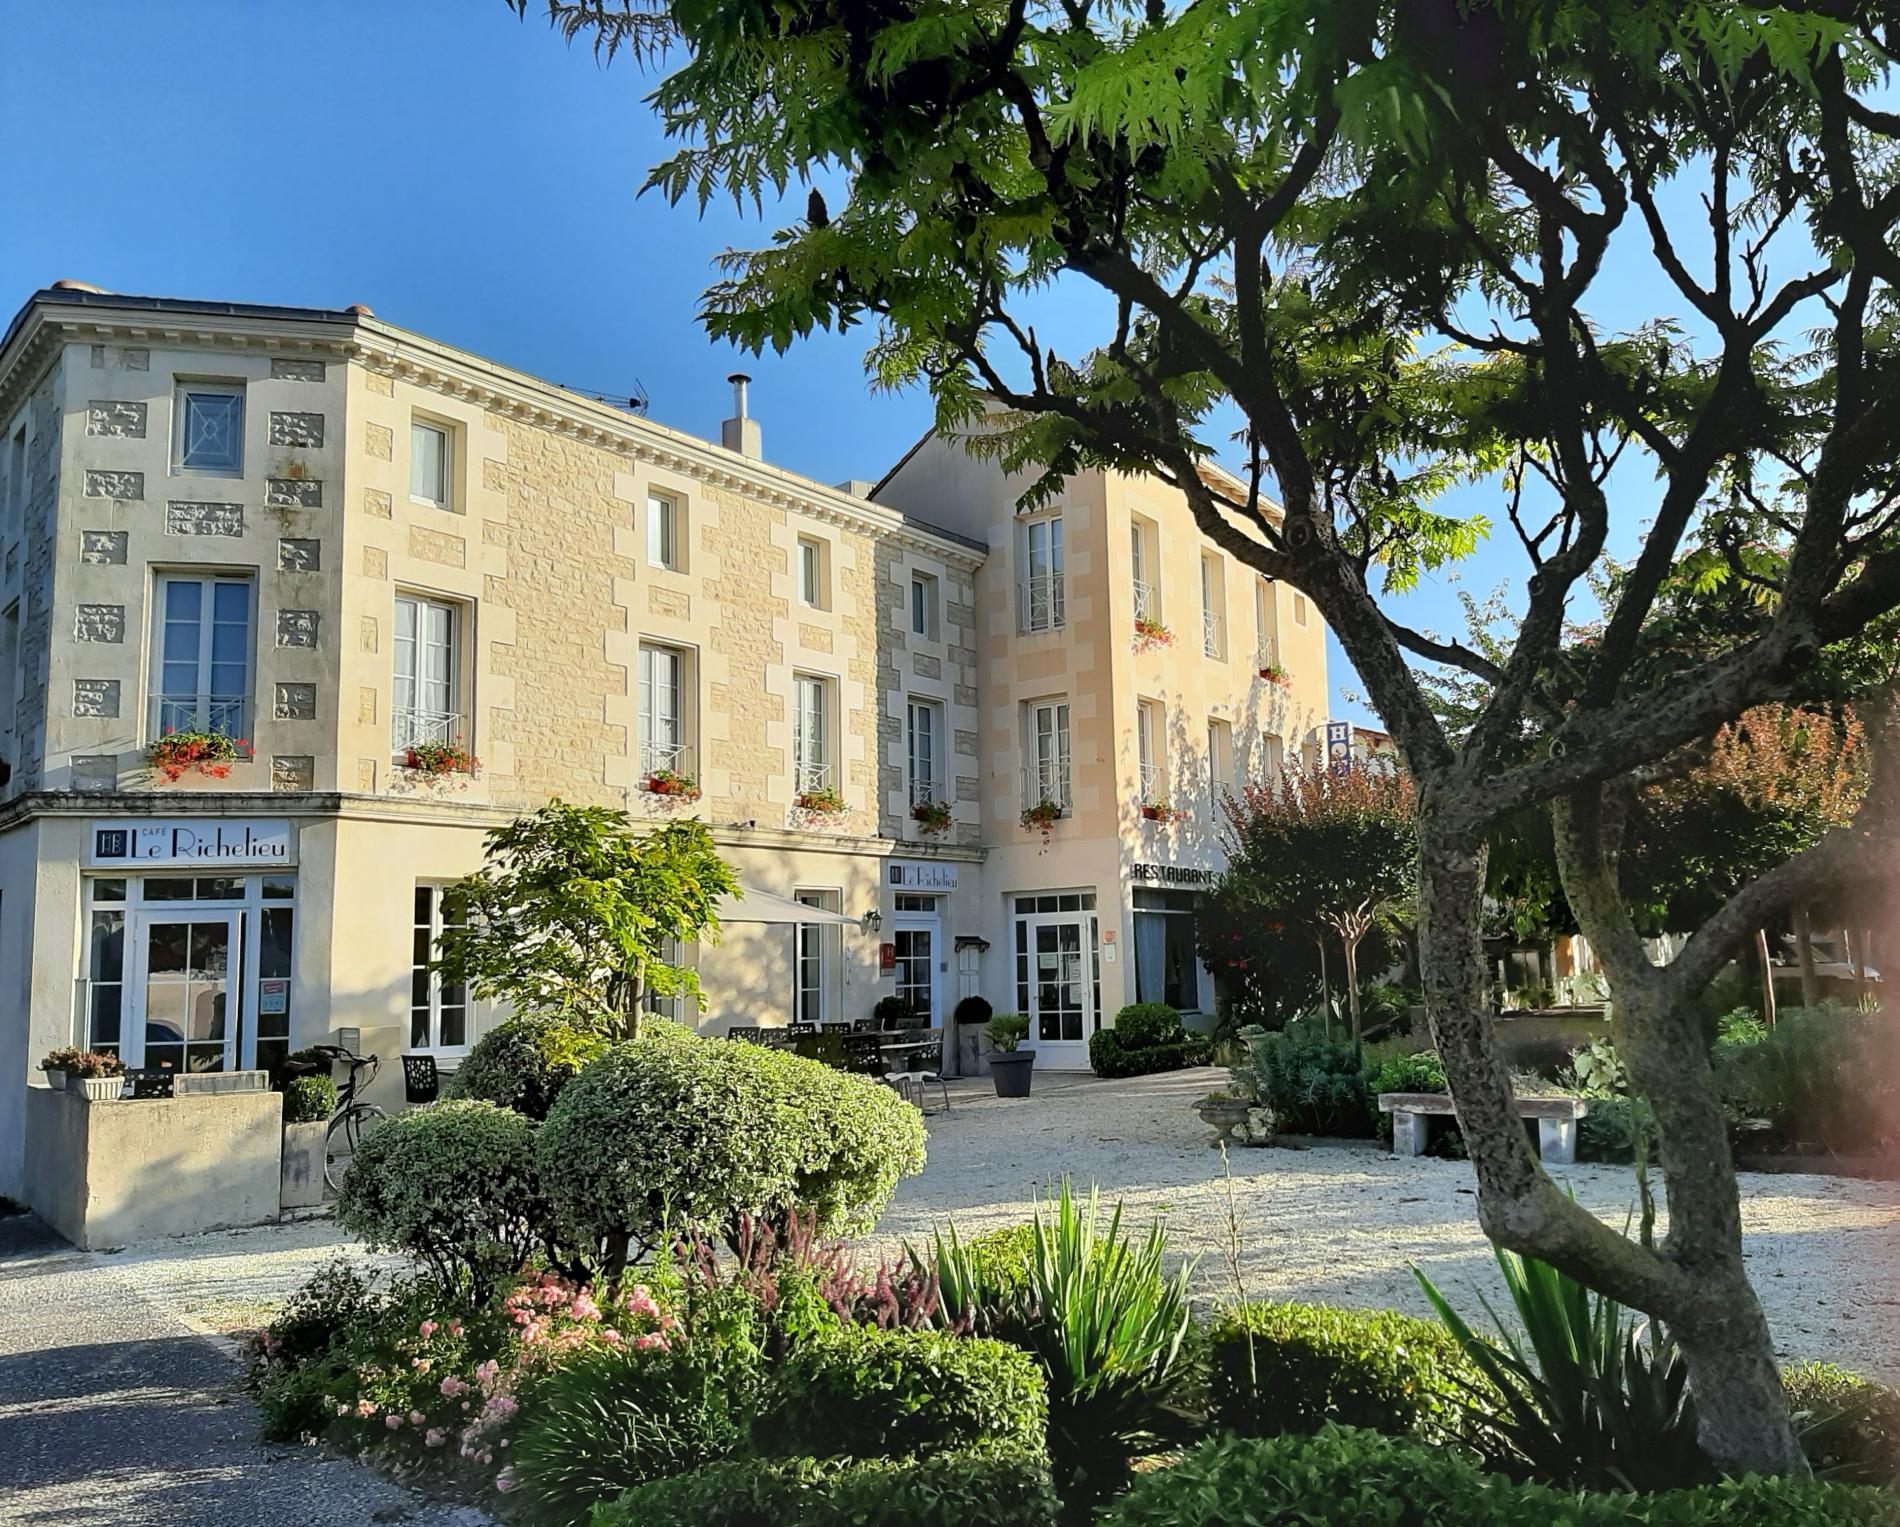 Hôtel le Richelieu Saujon